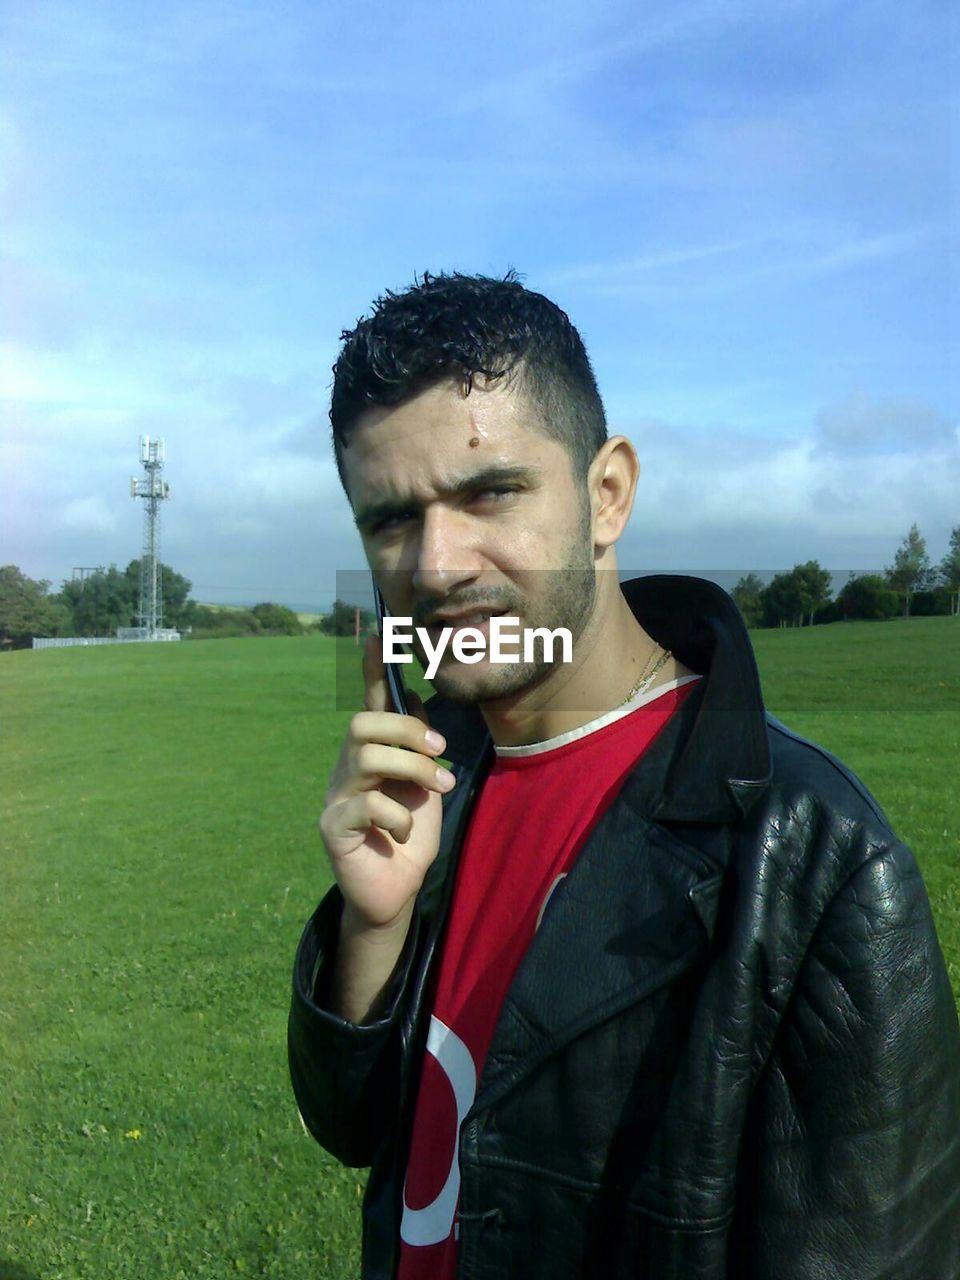 Man listening on mobile phone on grass in park against sky